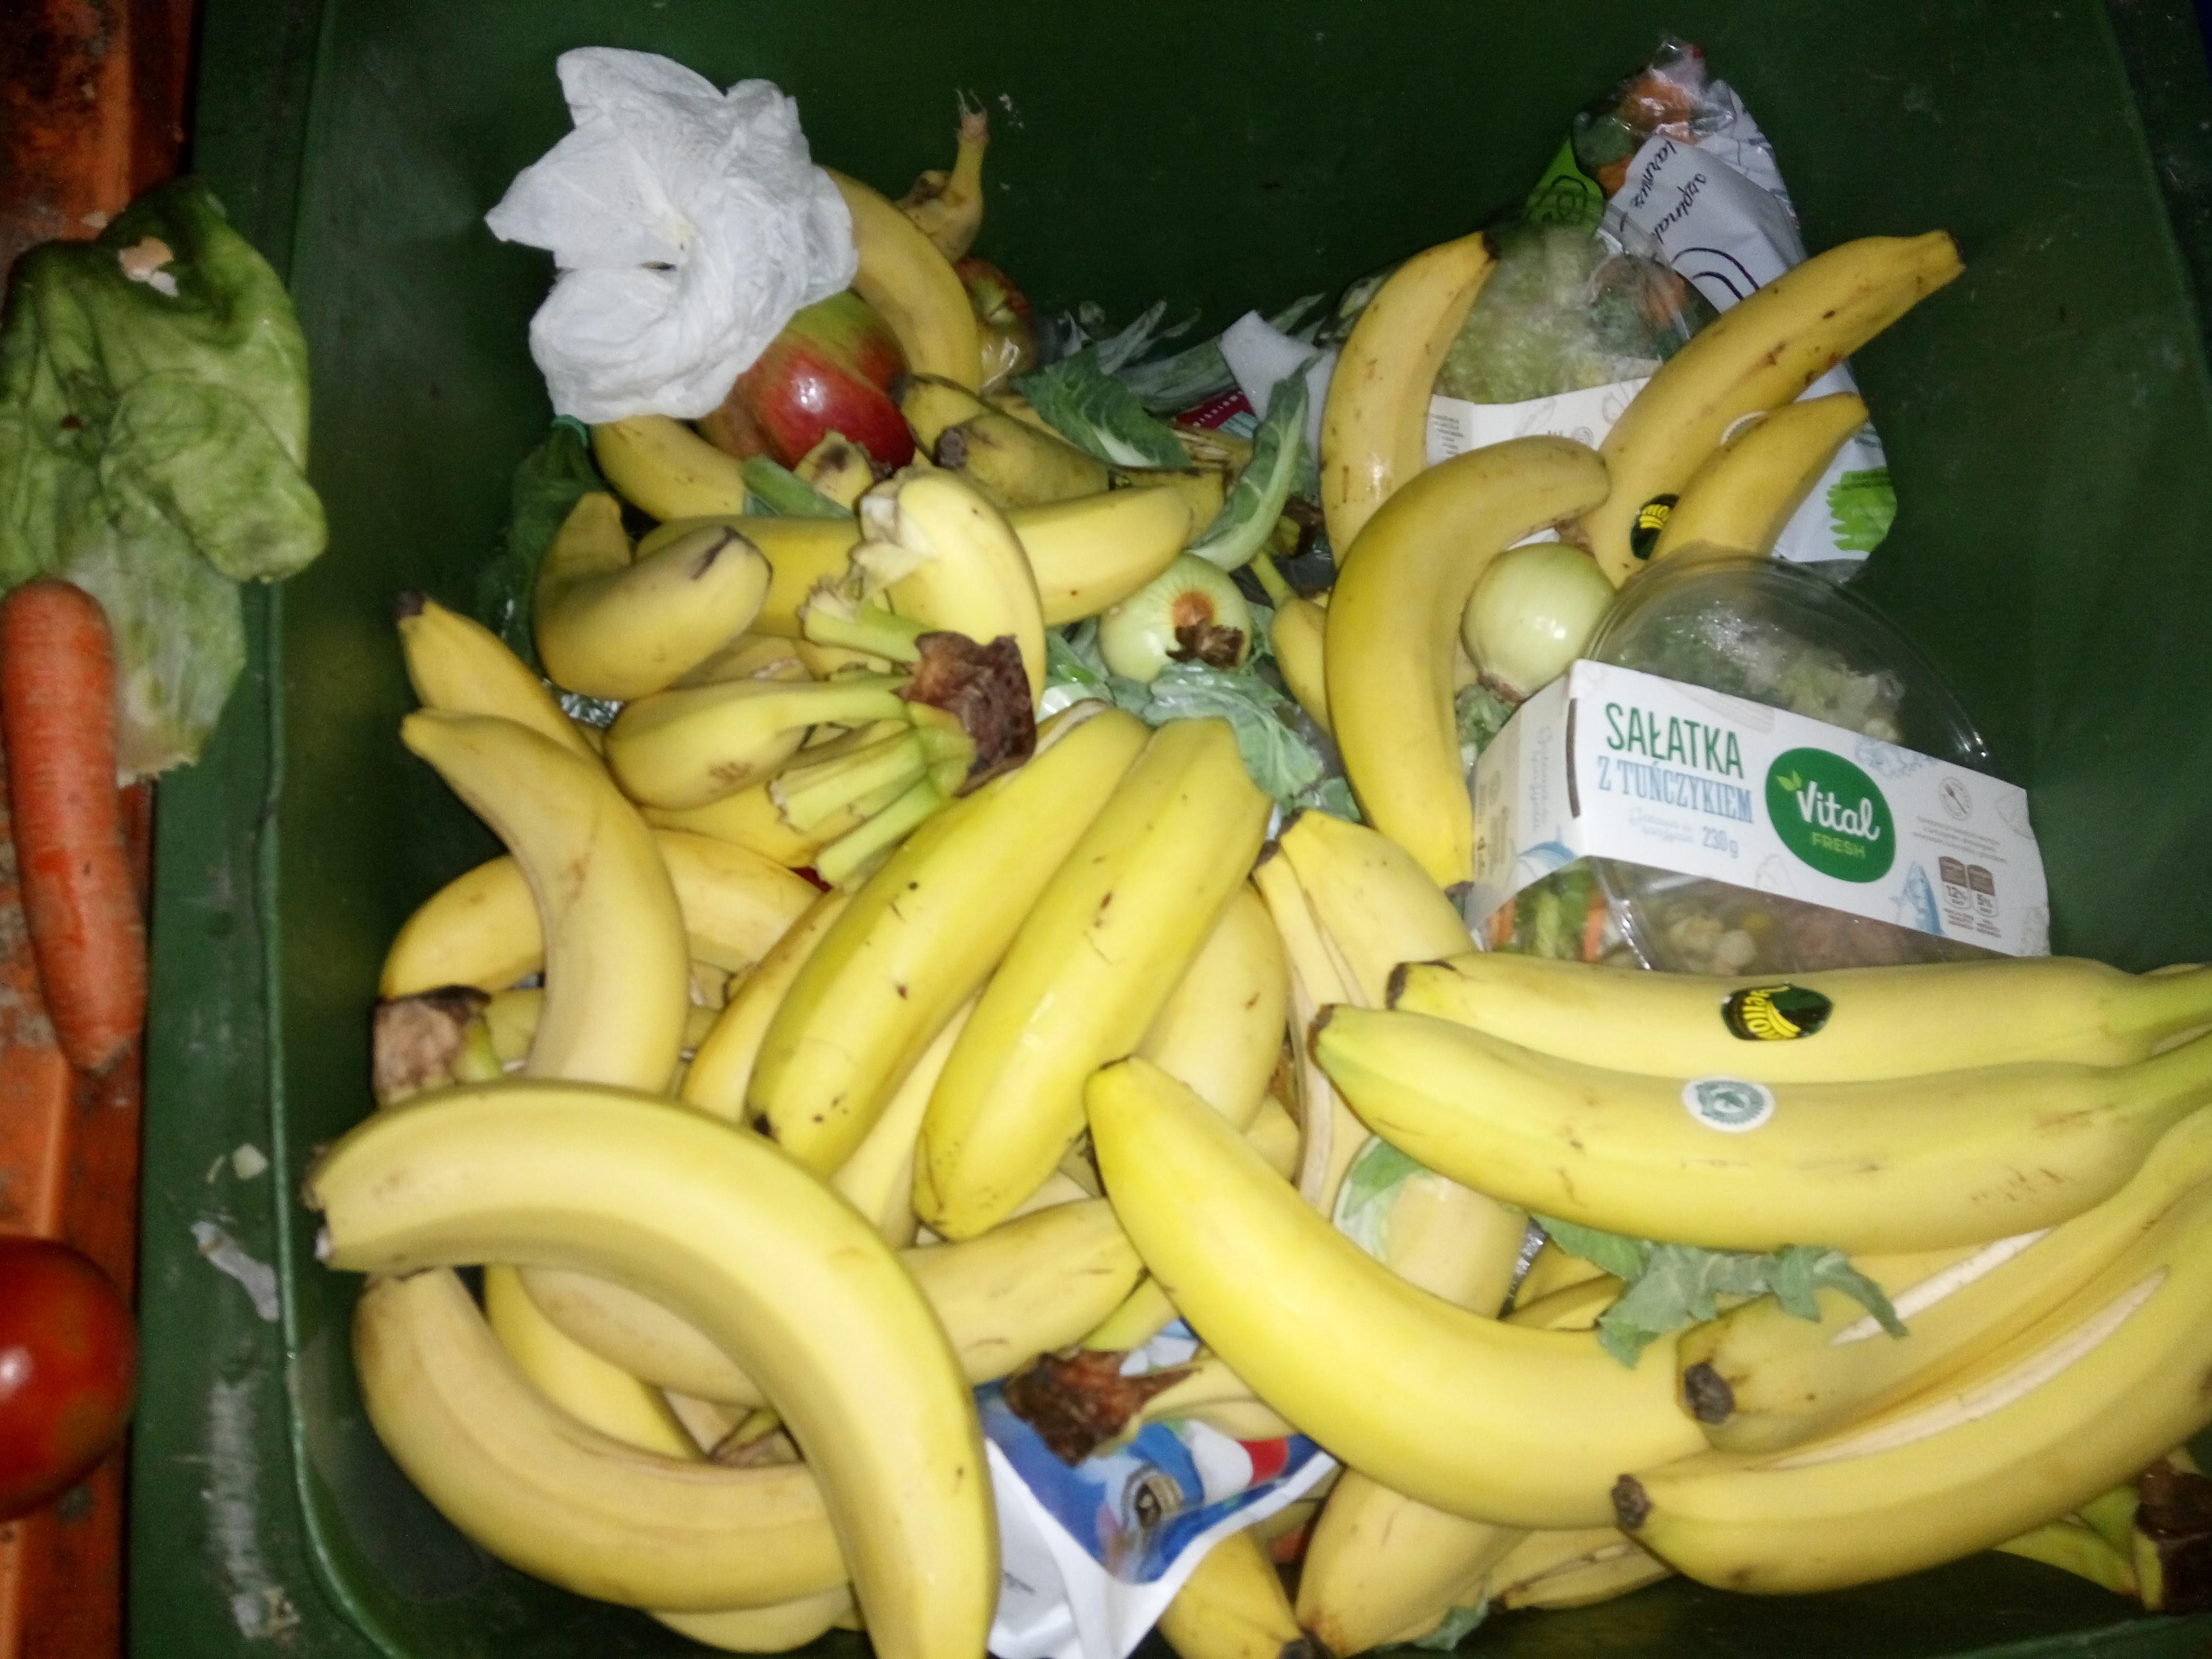 Niedoskonałe banany? A może banany-single?